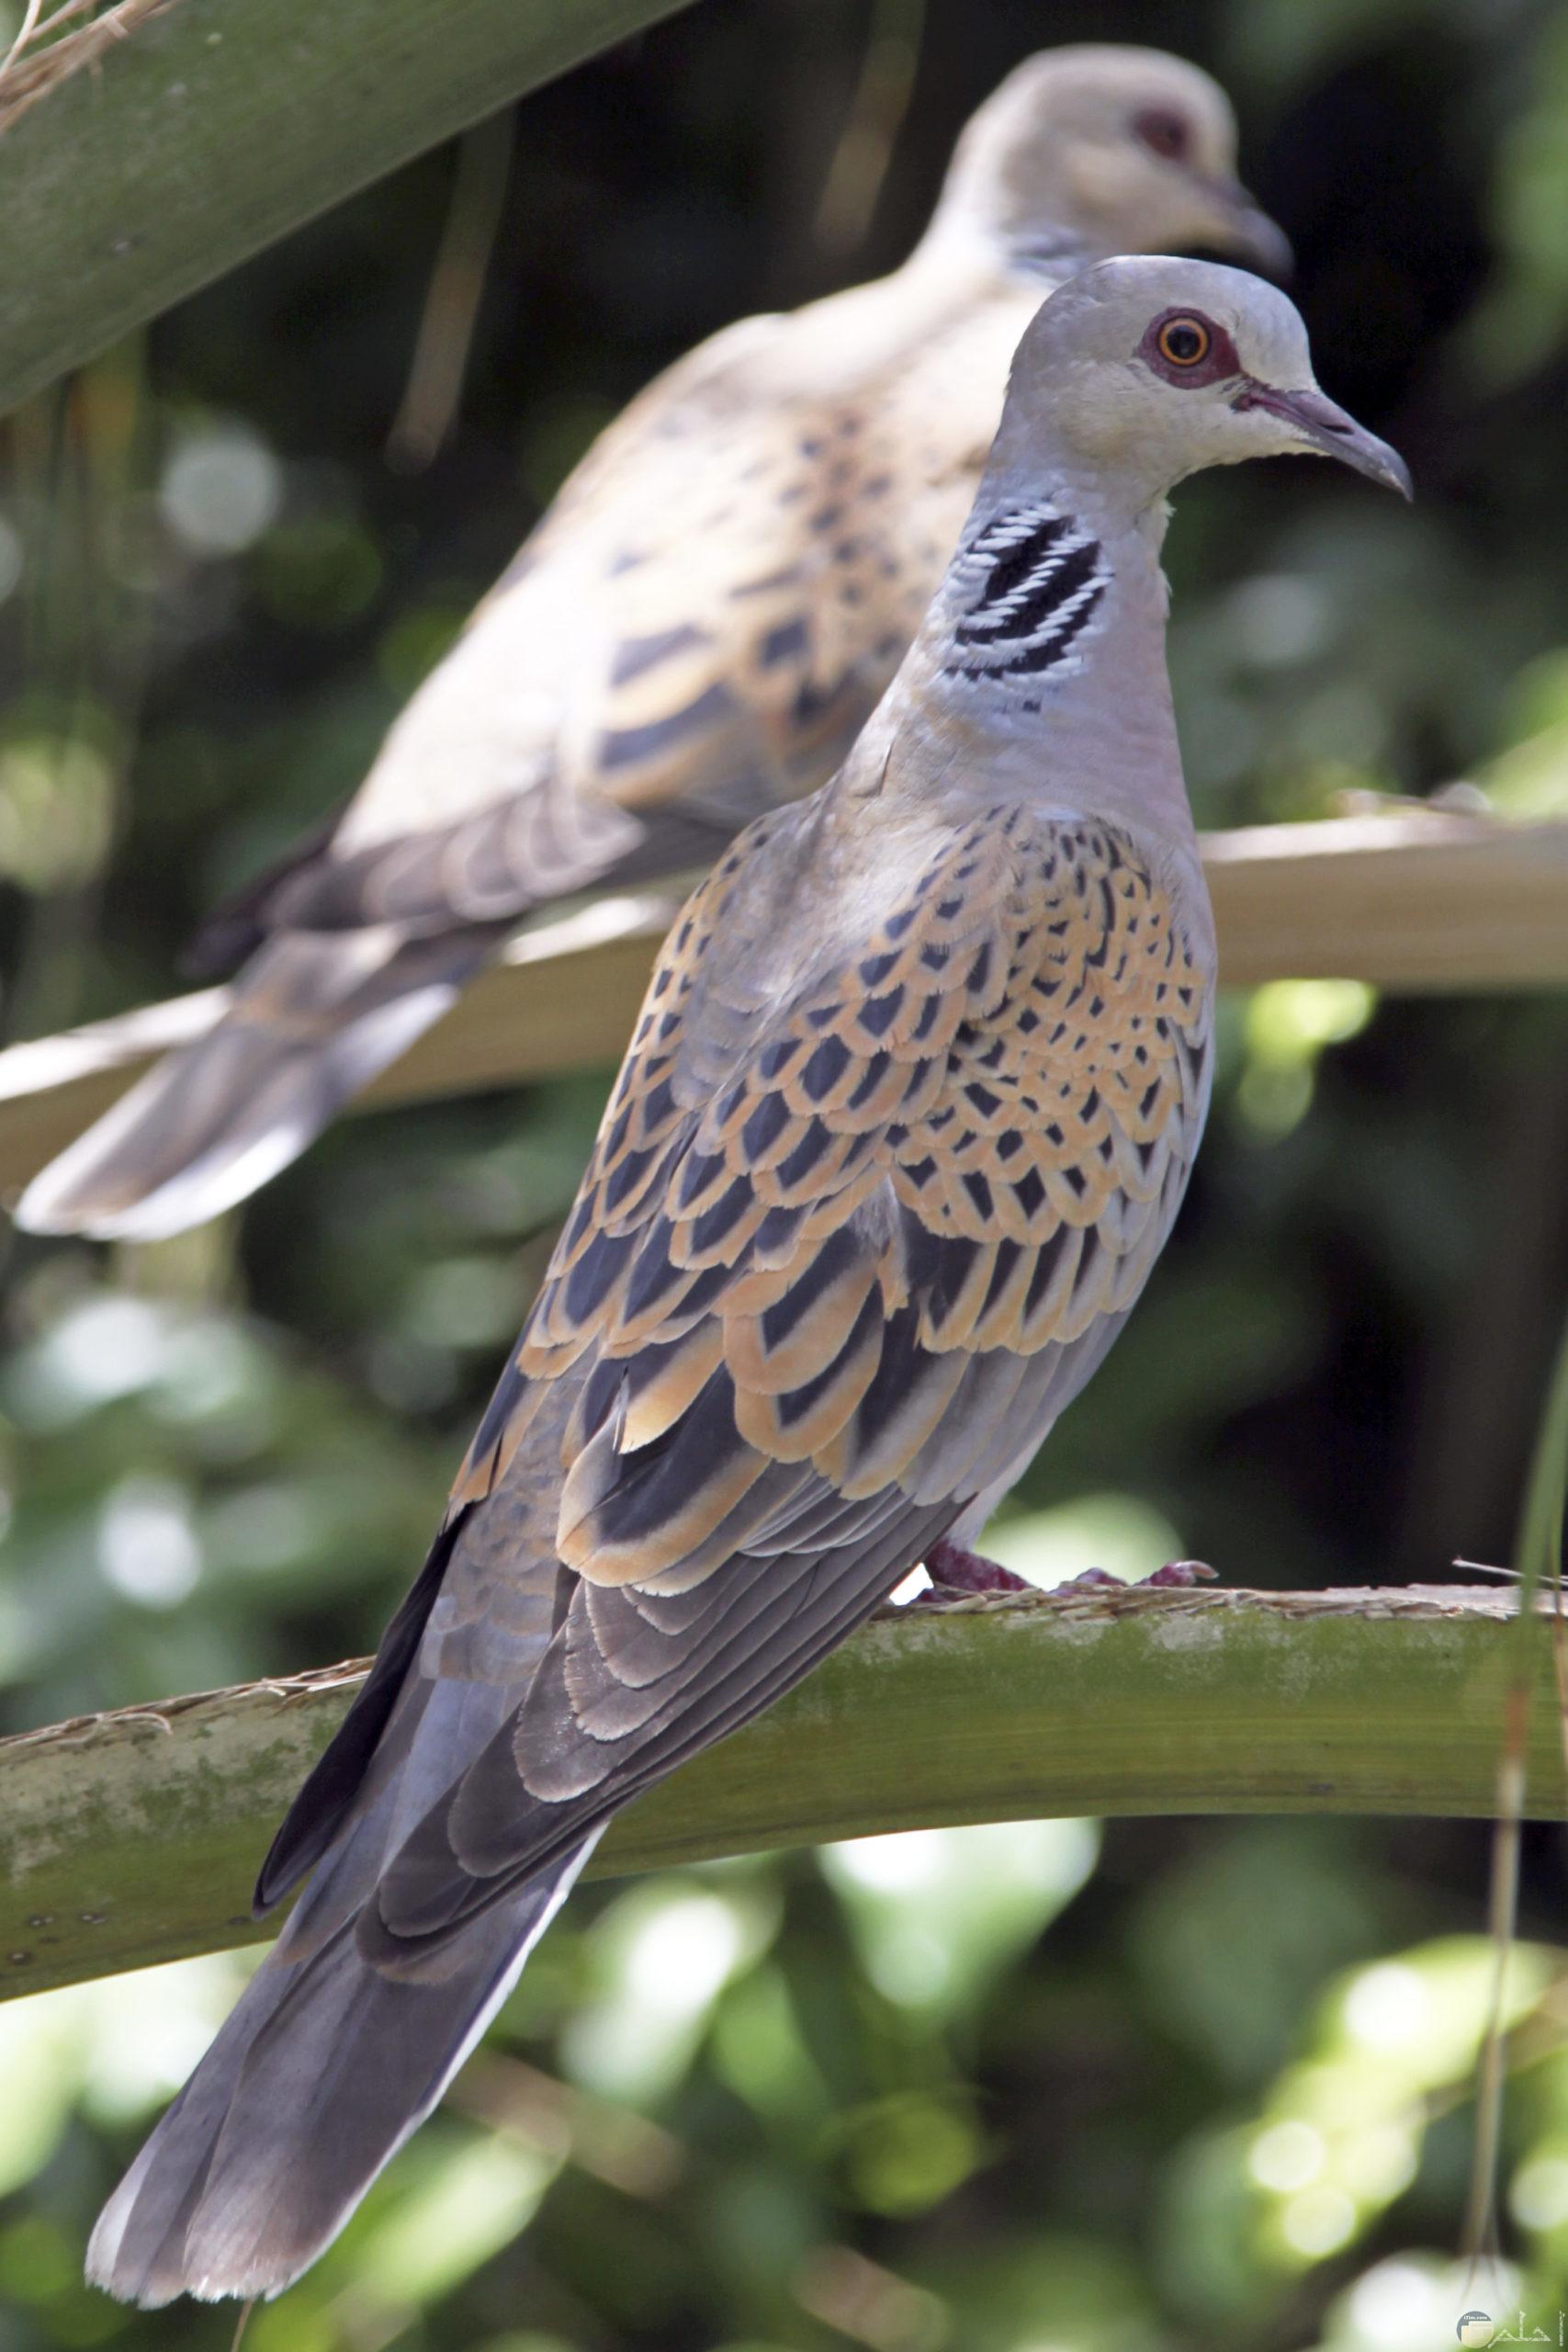 صورة كيوت لطيور القماري.